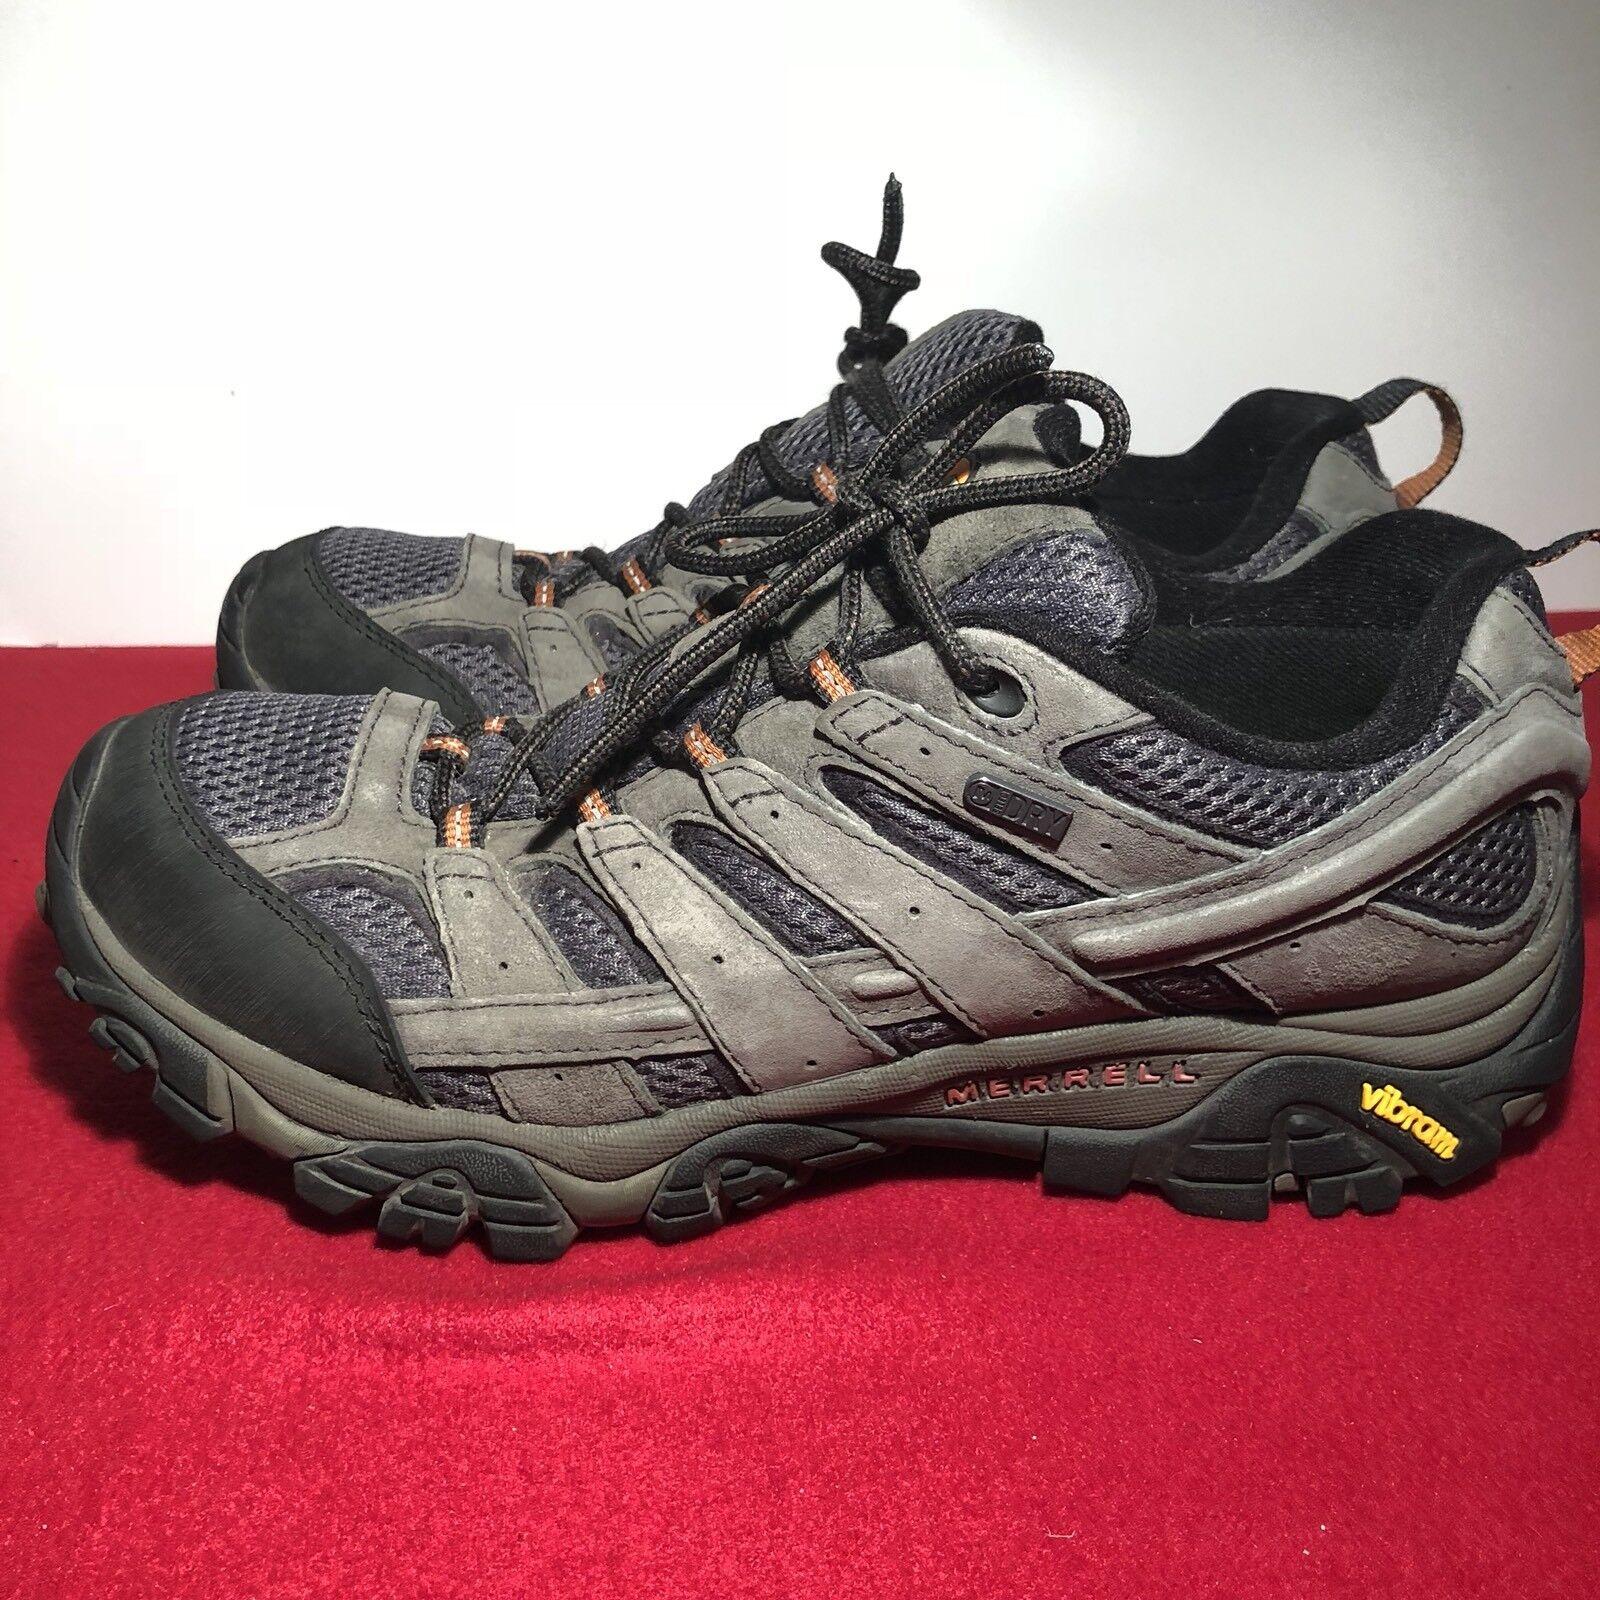 Merrell Moab 2 Mens US Sz 10 Waterproof Trail Hiking shoes J06031 Beluga Suede